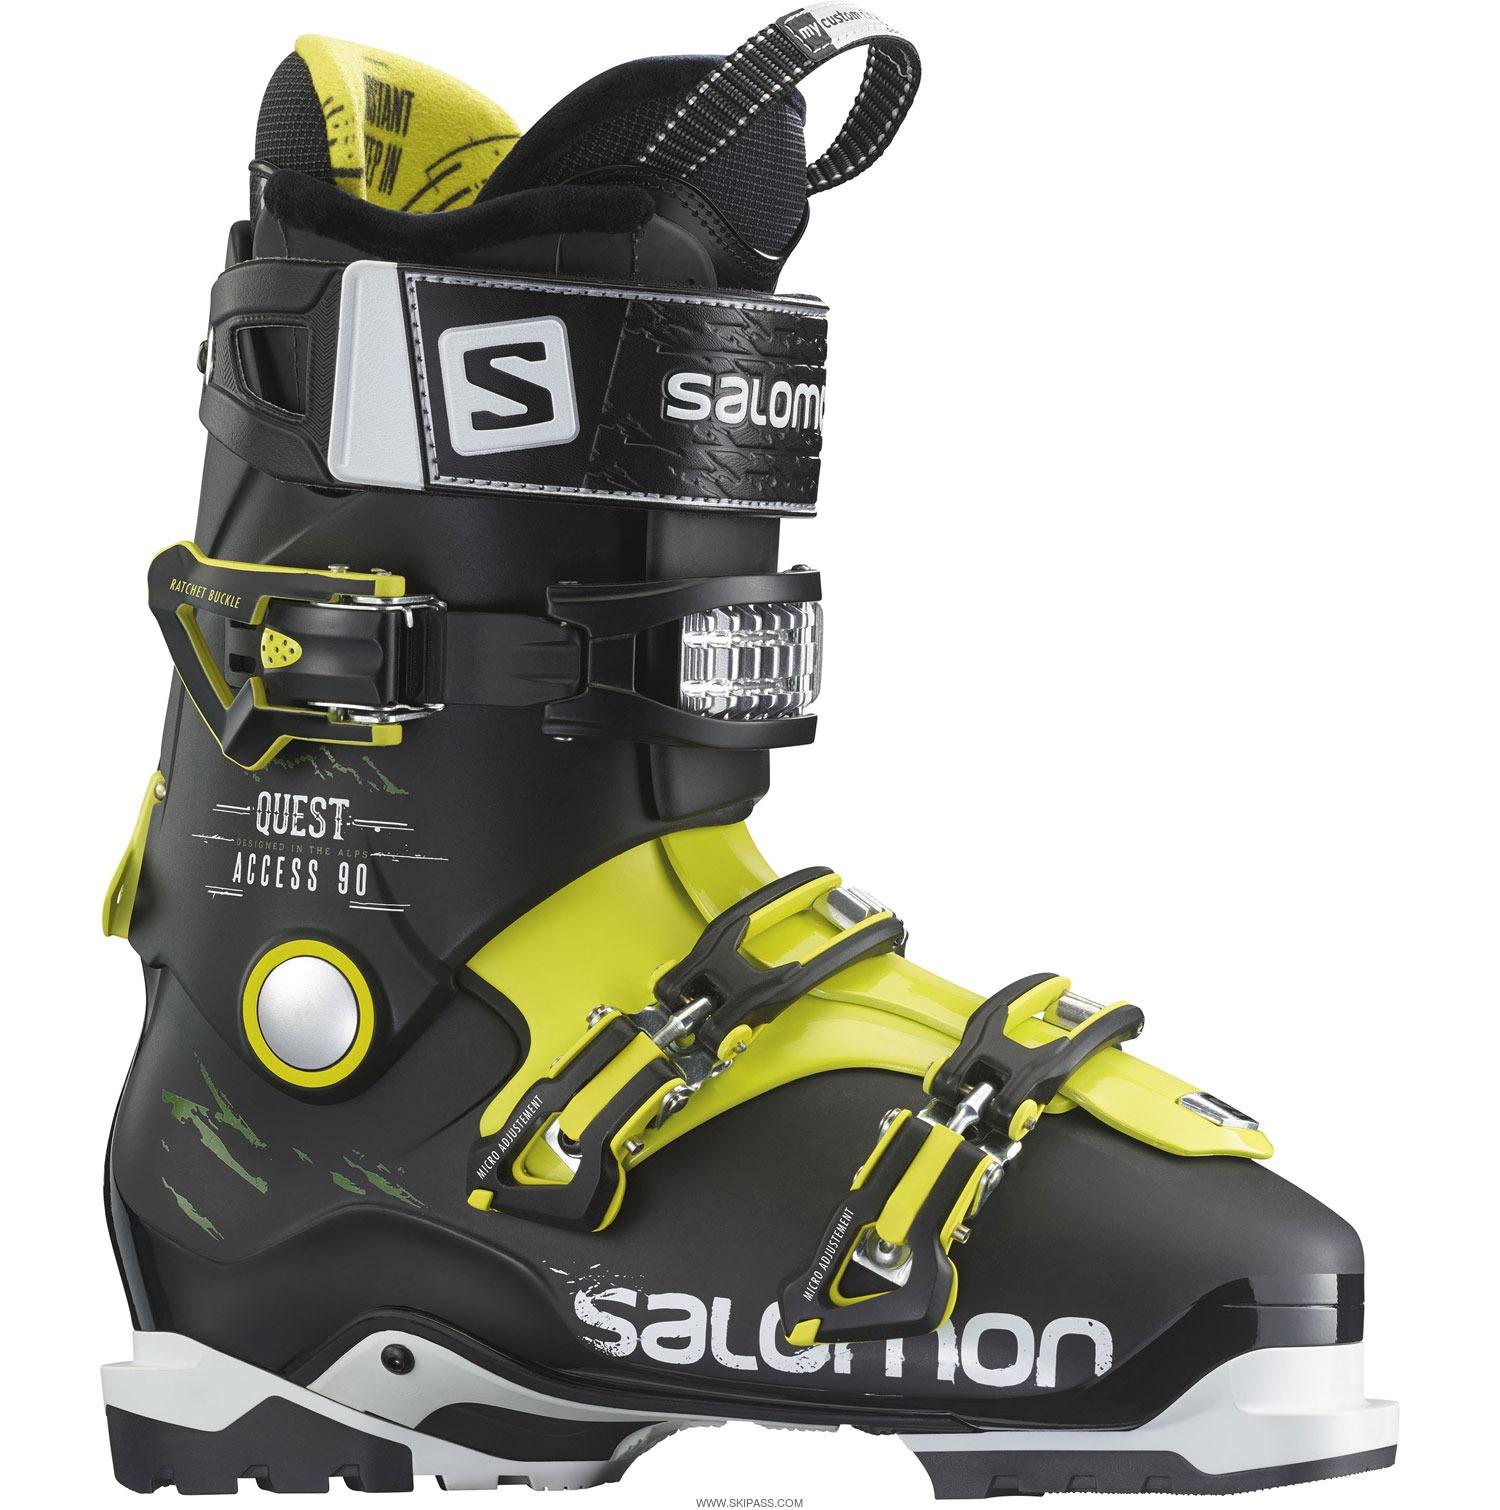 Salomon Quest Access 90 Chaussure Ski Homme  - Chaussures Ski Homme